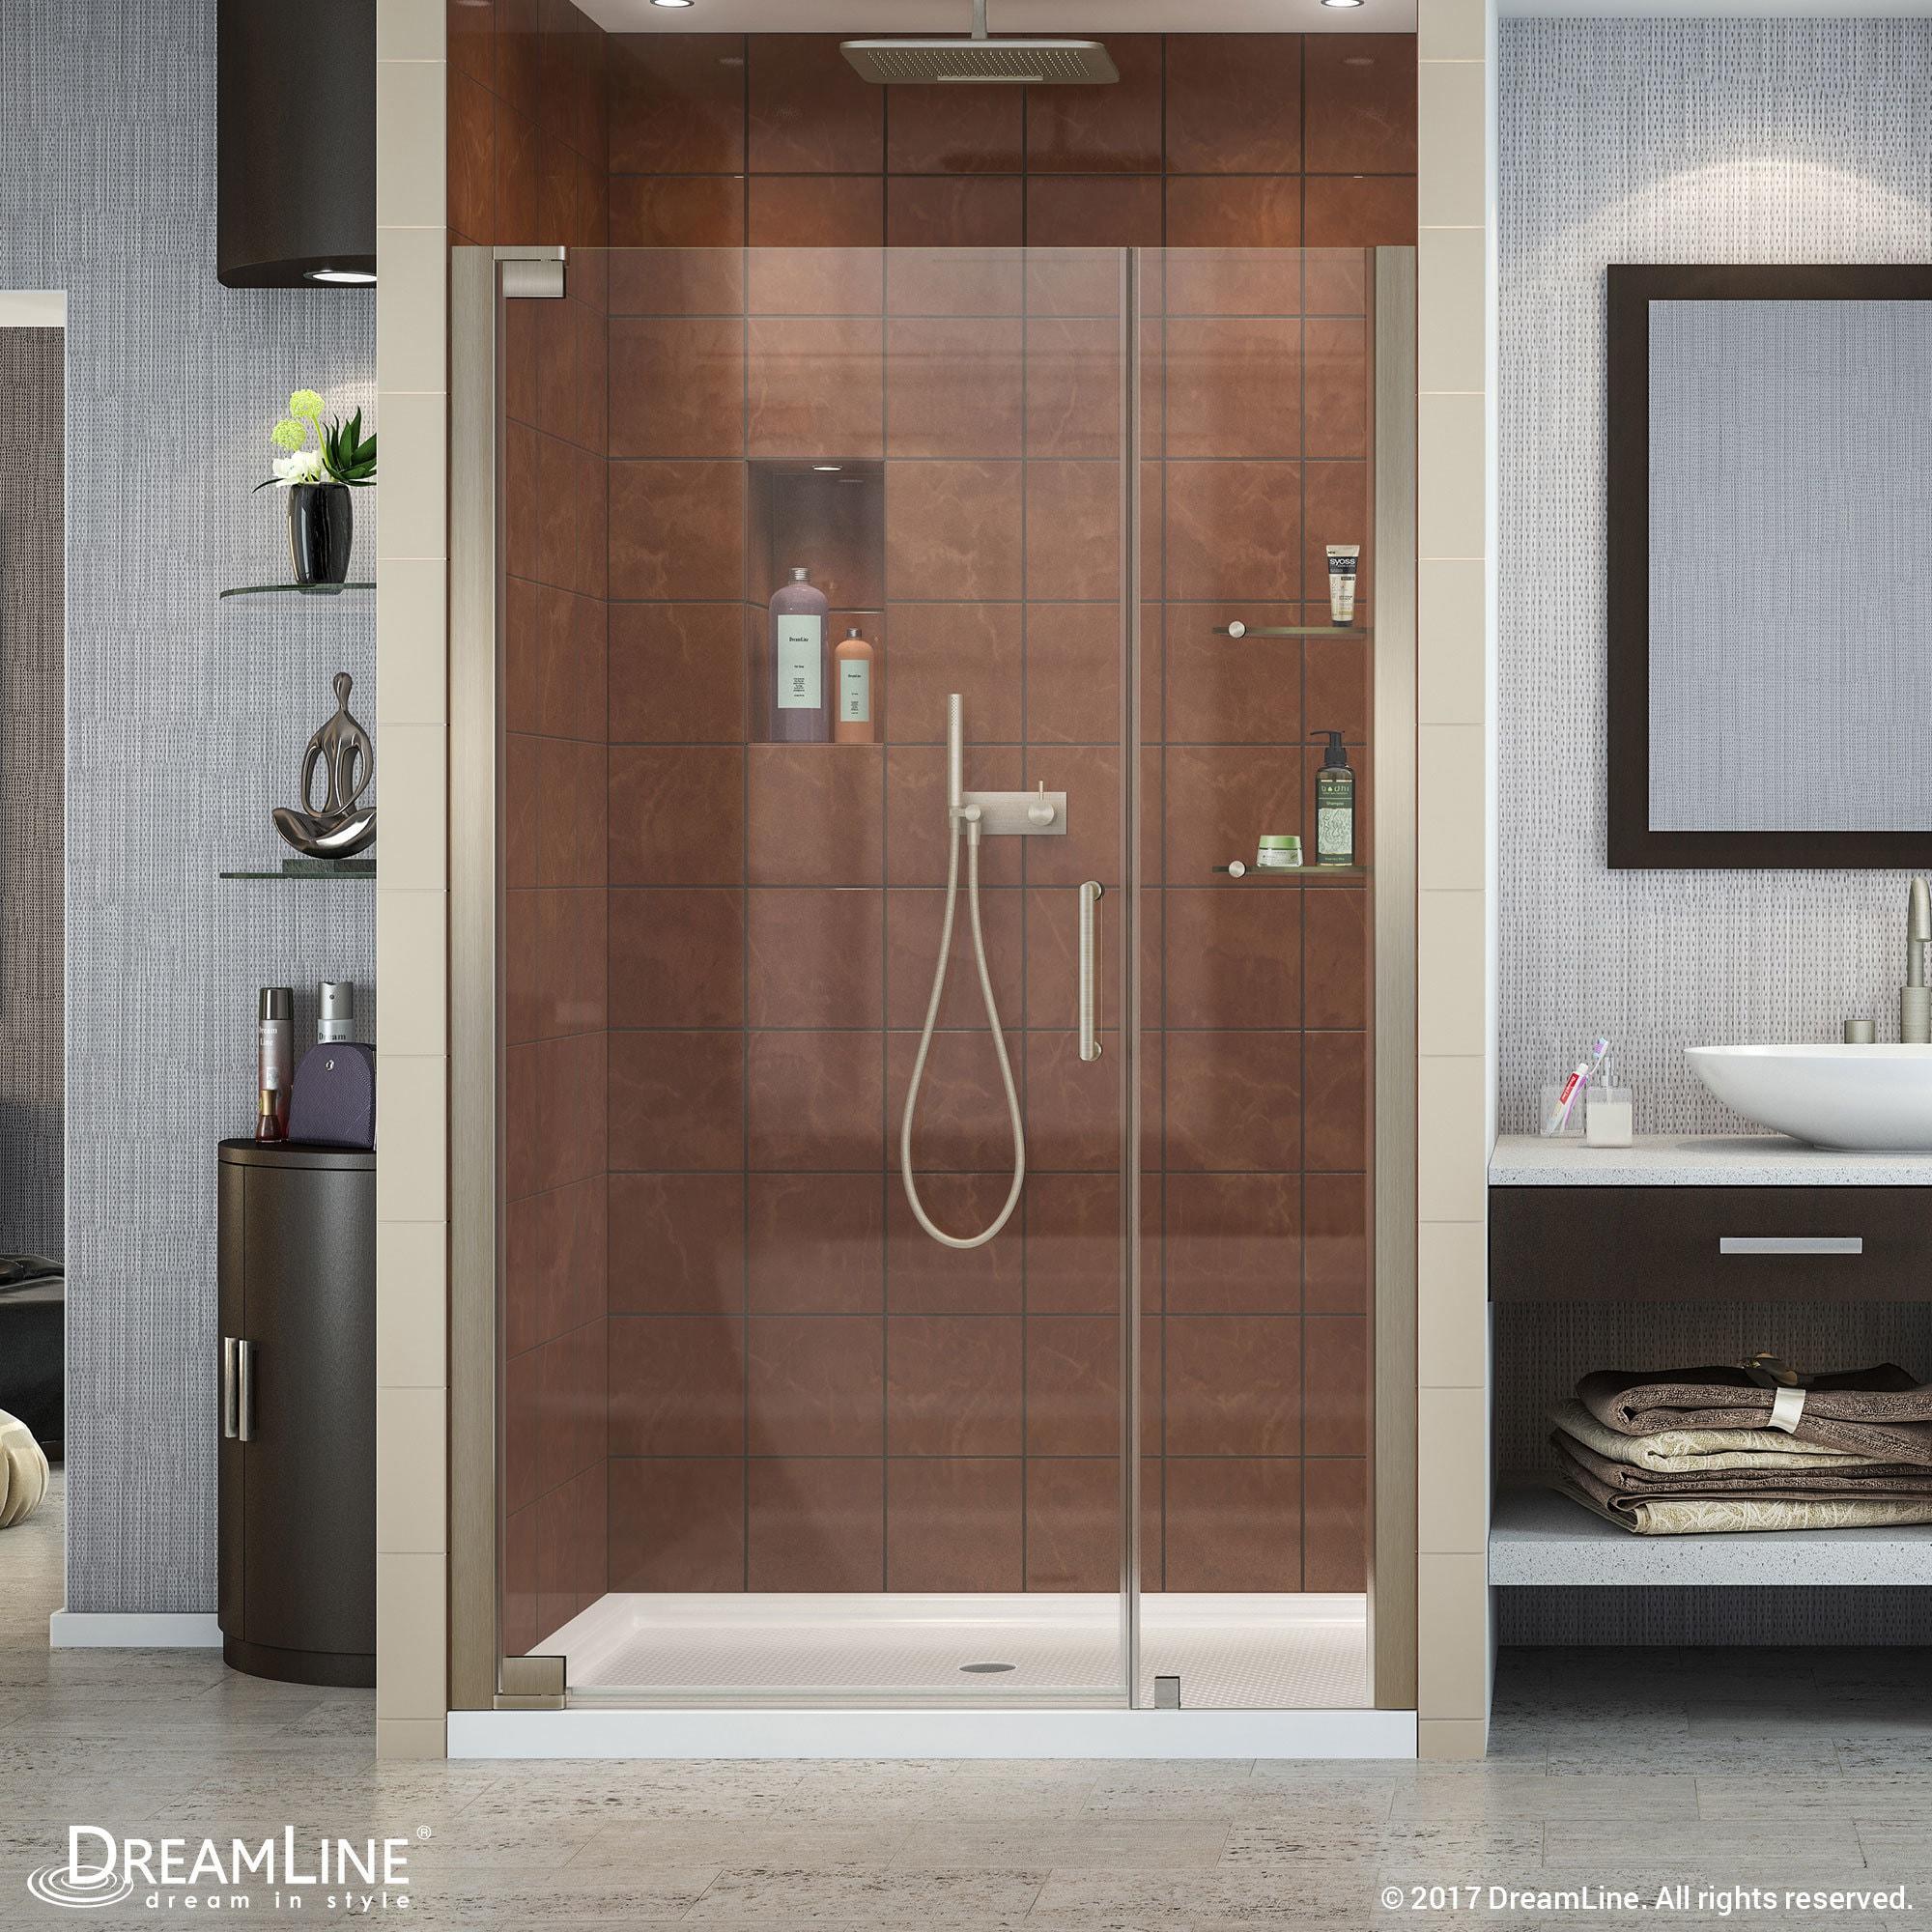 Shop Dreamline Elegance 46 48 In W X 72 In H Frameless Pivot